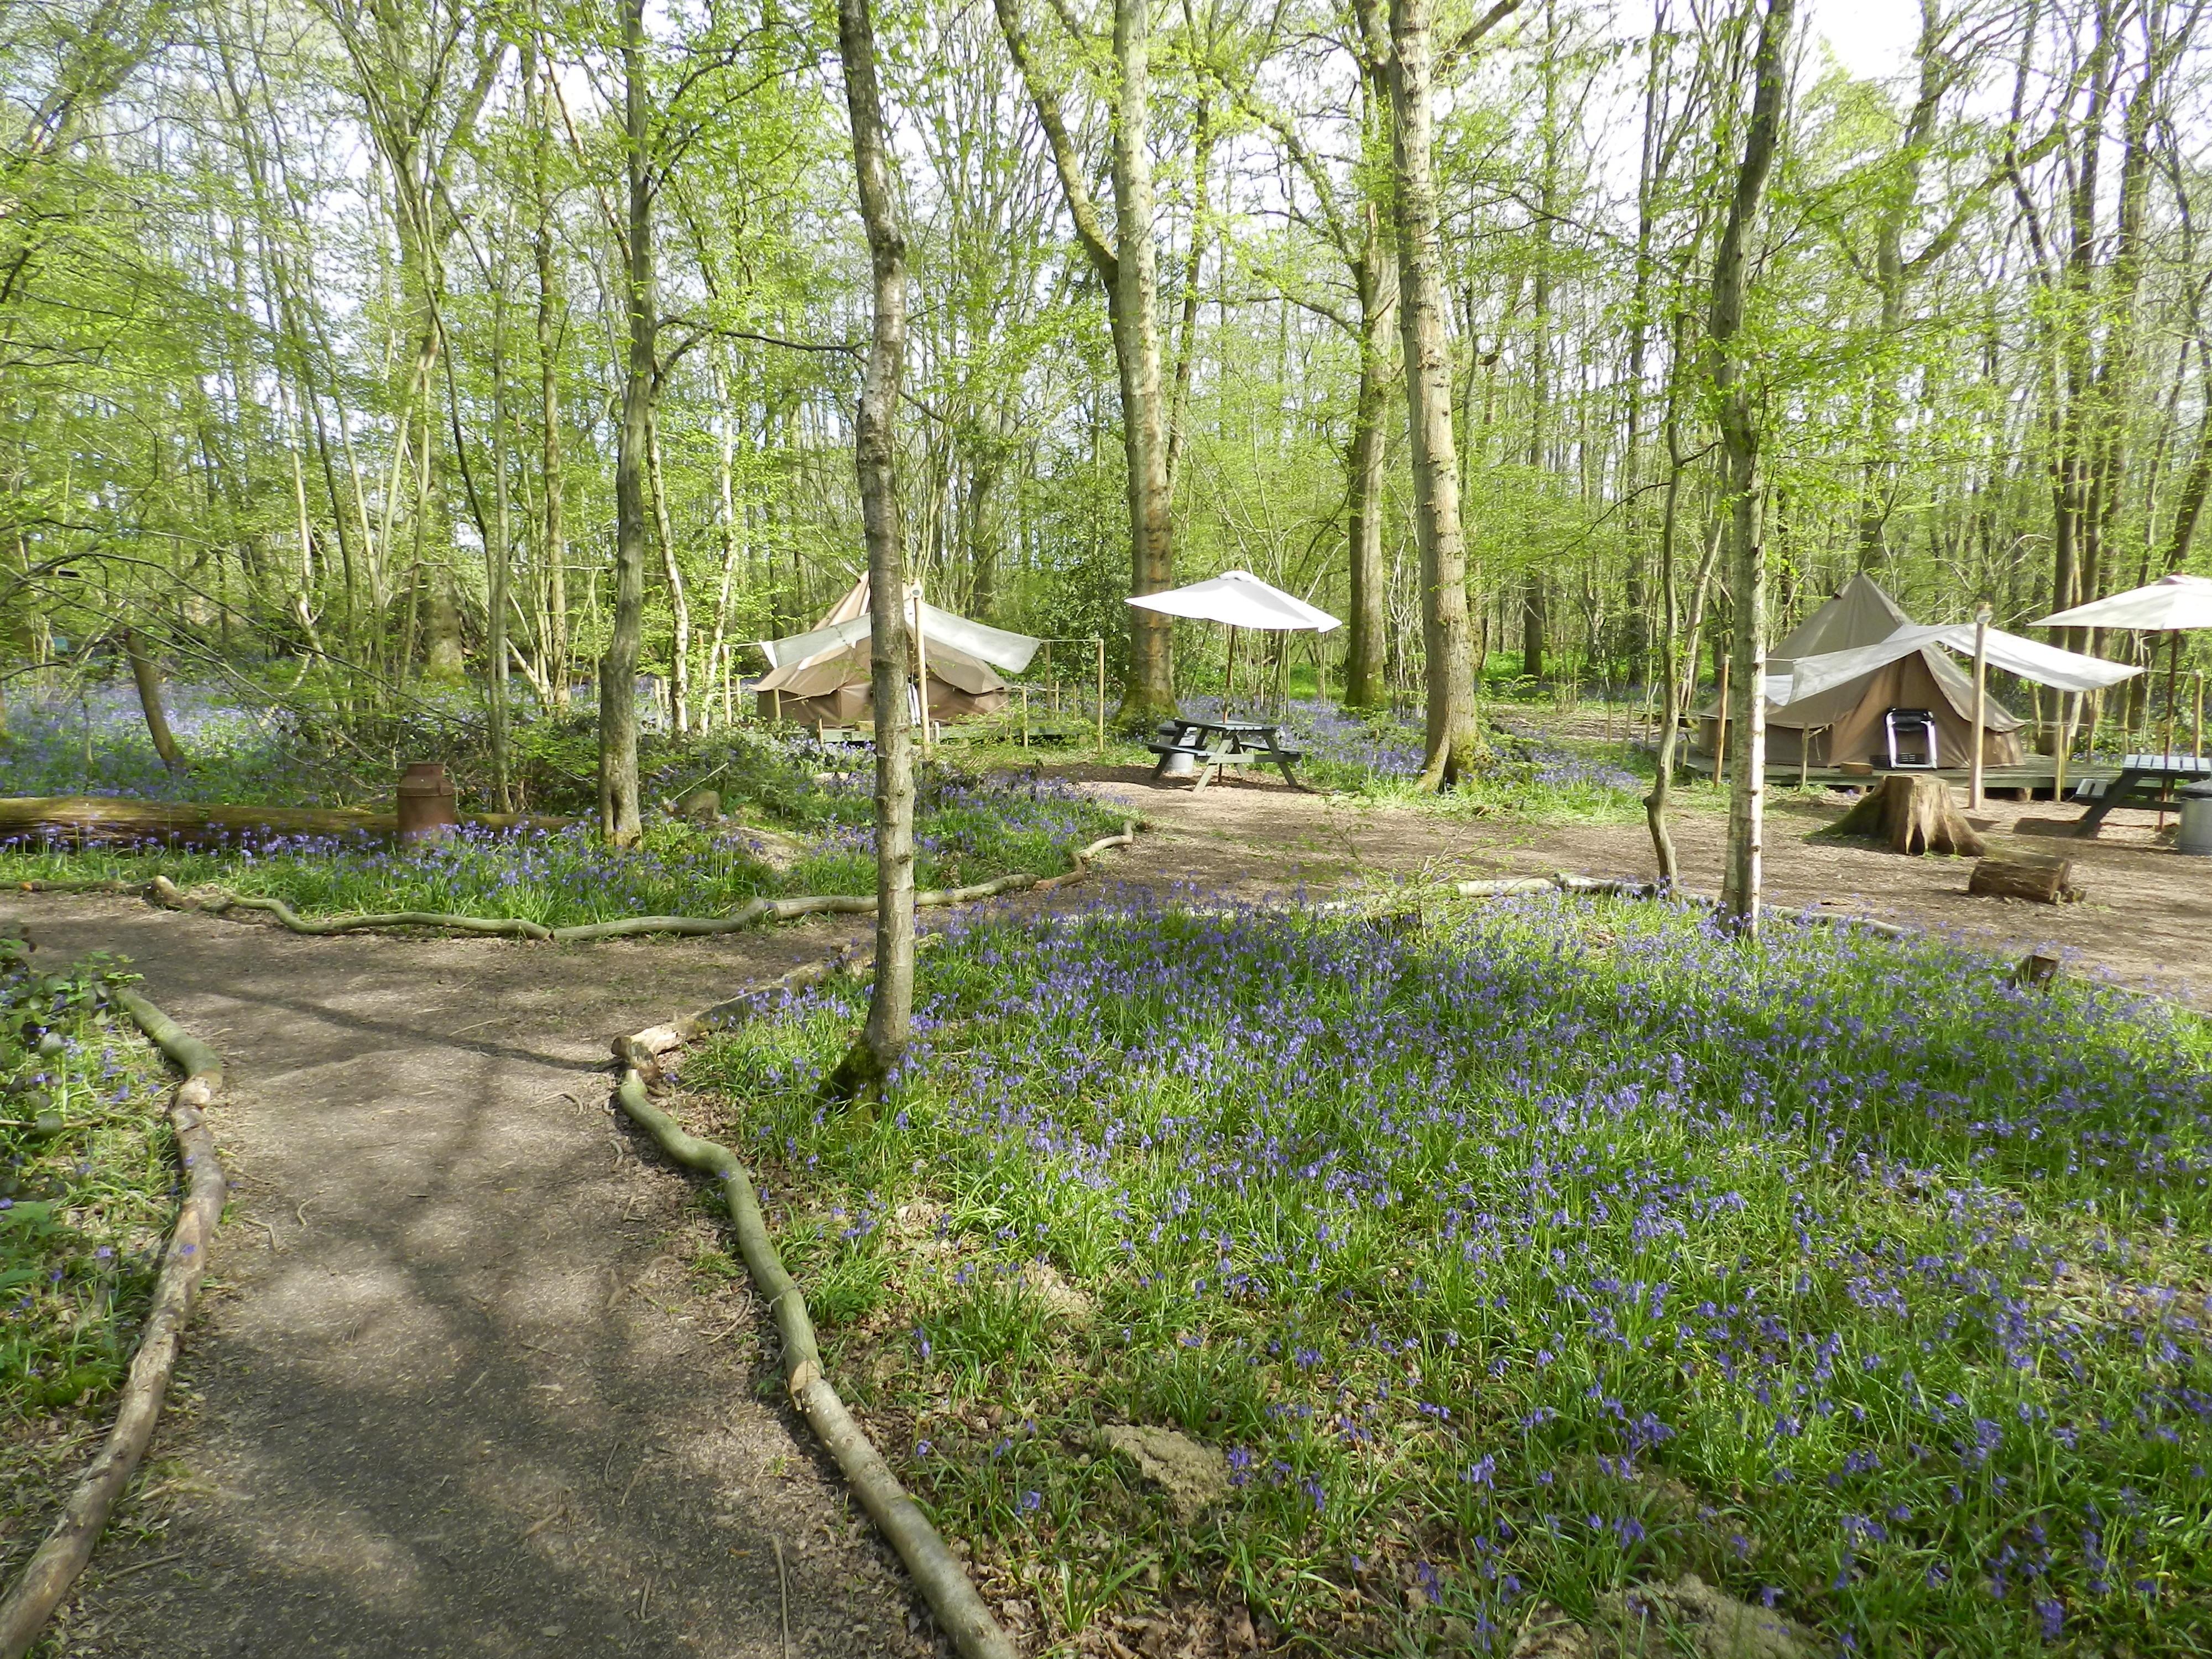 Campsite warden jobs. Alternative Camping Lifestyle?